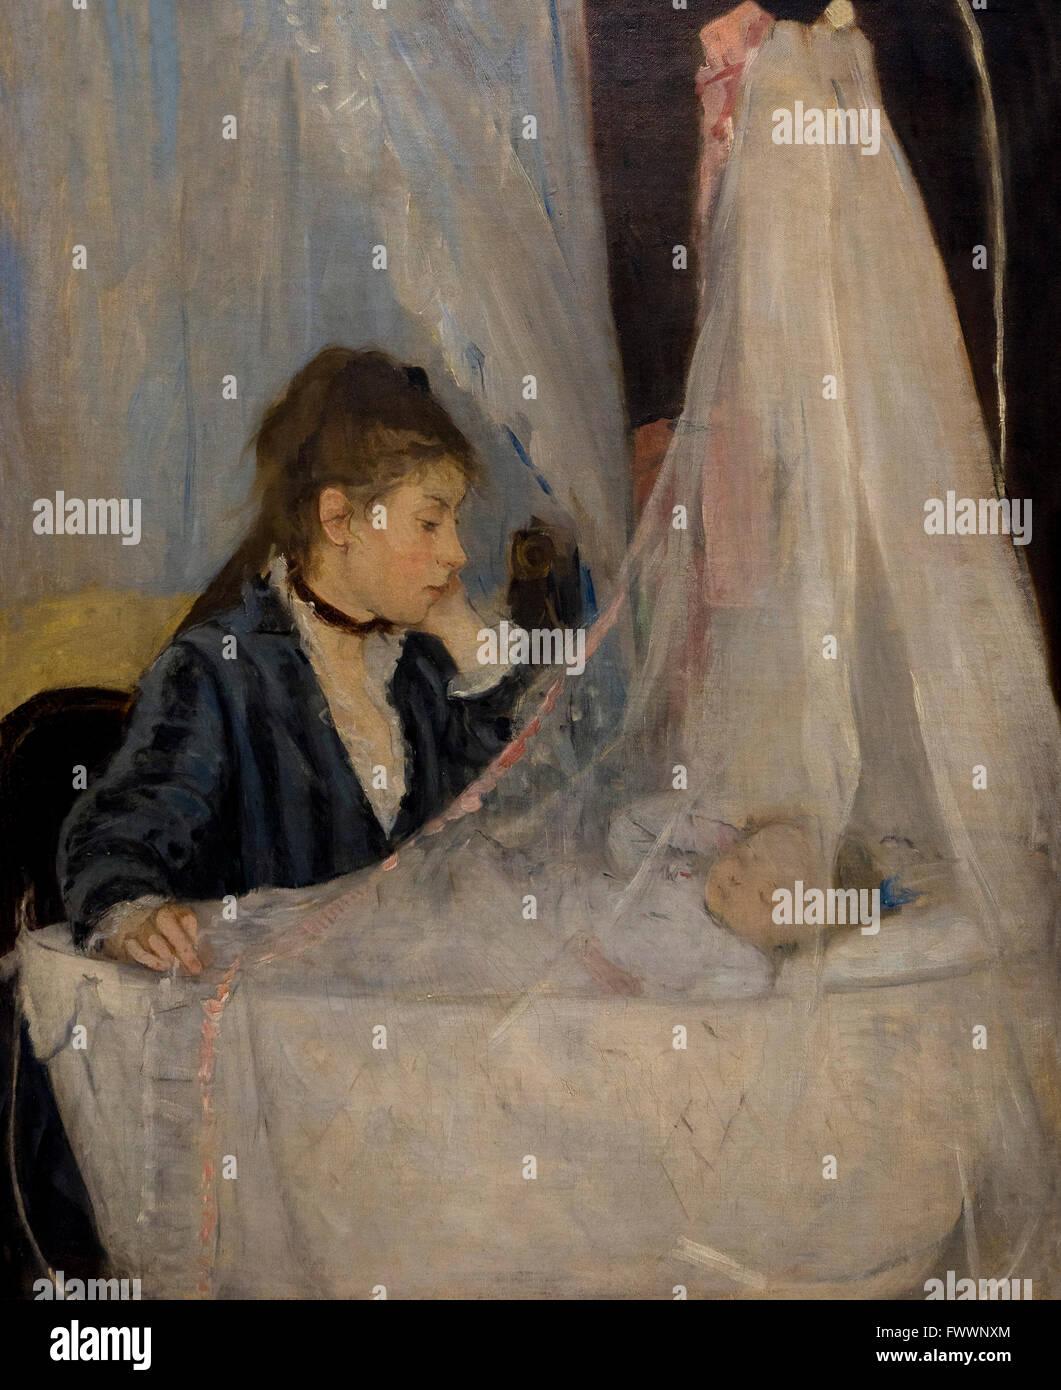 La Cuna, Le Berceau, Berthe Morisot, 1872, Musée d'Orsay de París Francia Europa Imagen De Stock